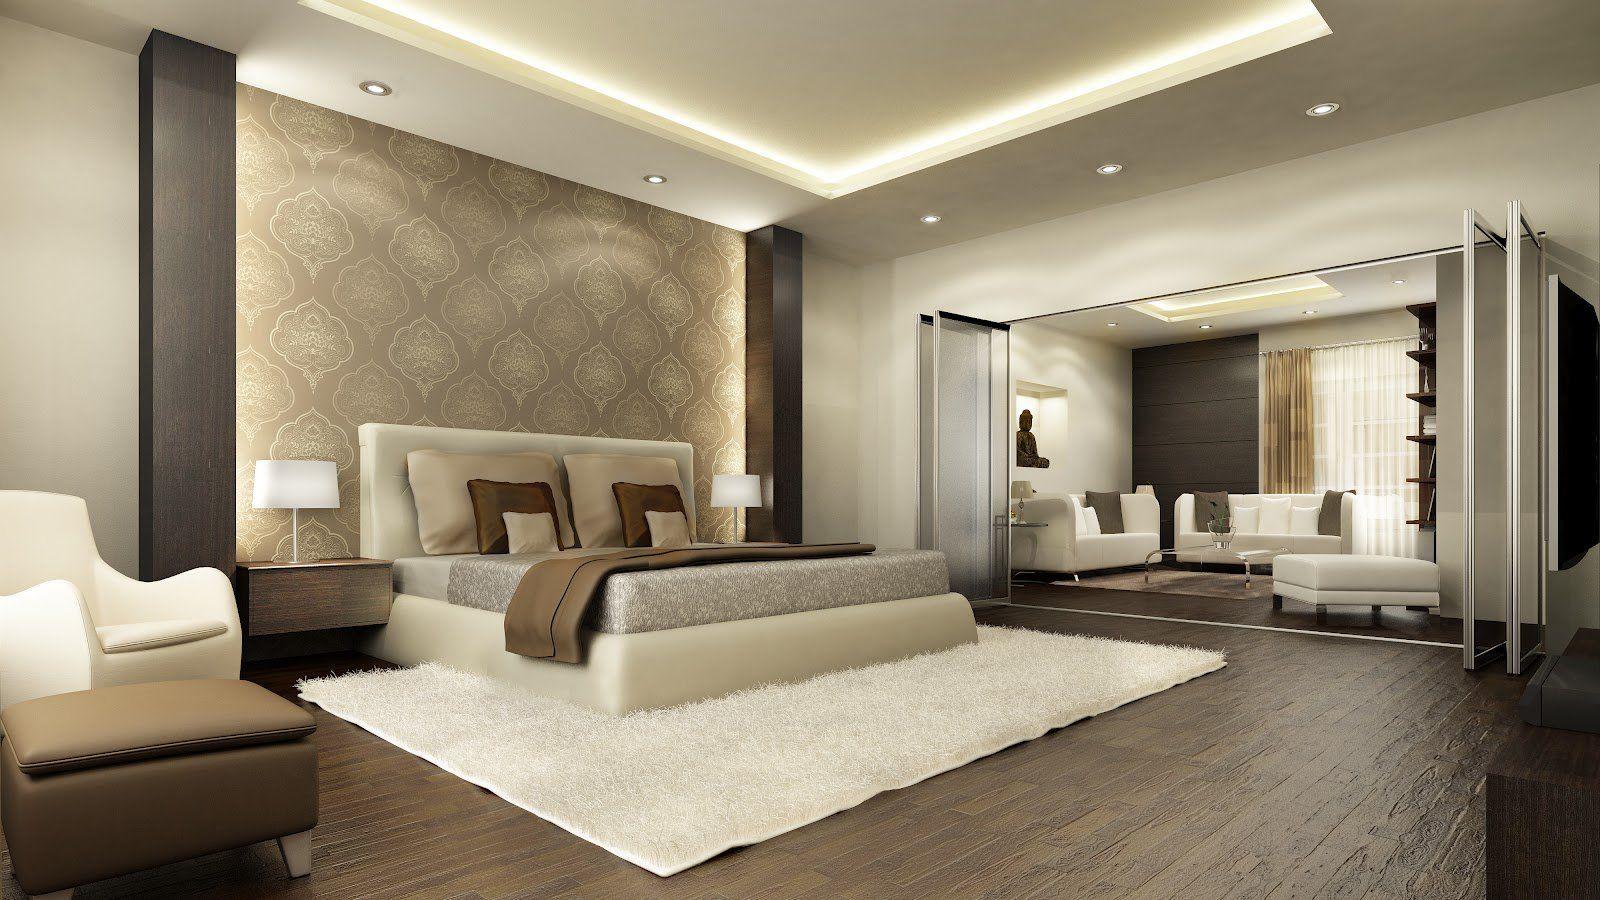 Modern Interior On Twitter Modern Master Bedroom Design Luxury Bedroom Master Master Bedroom Interior